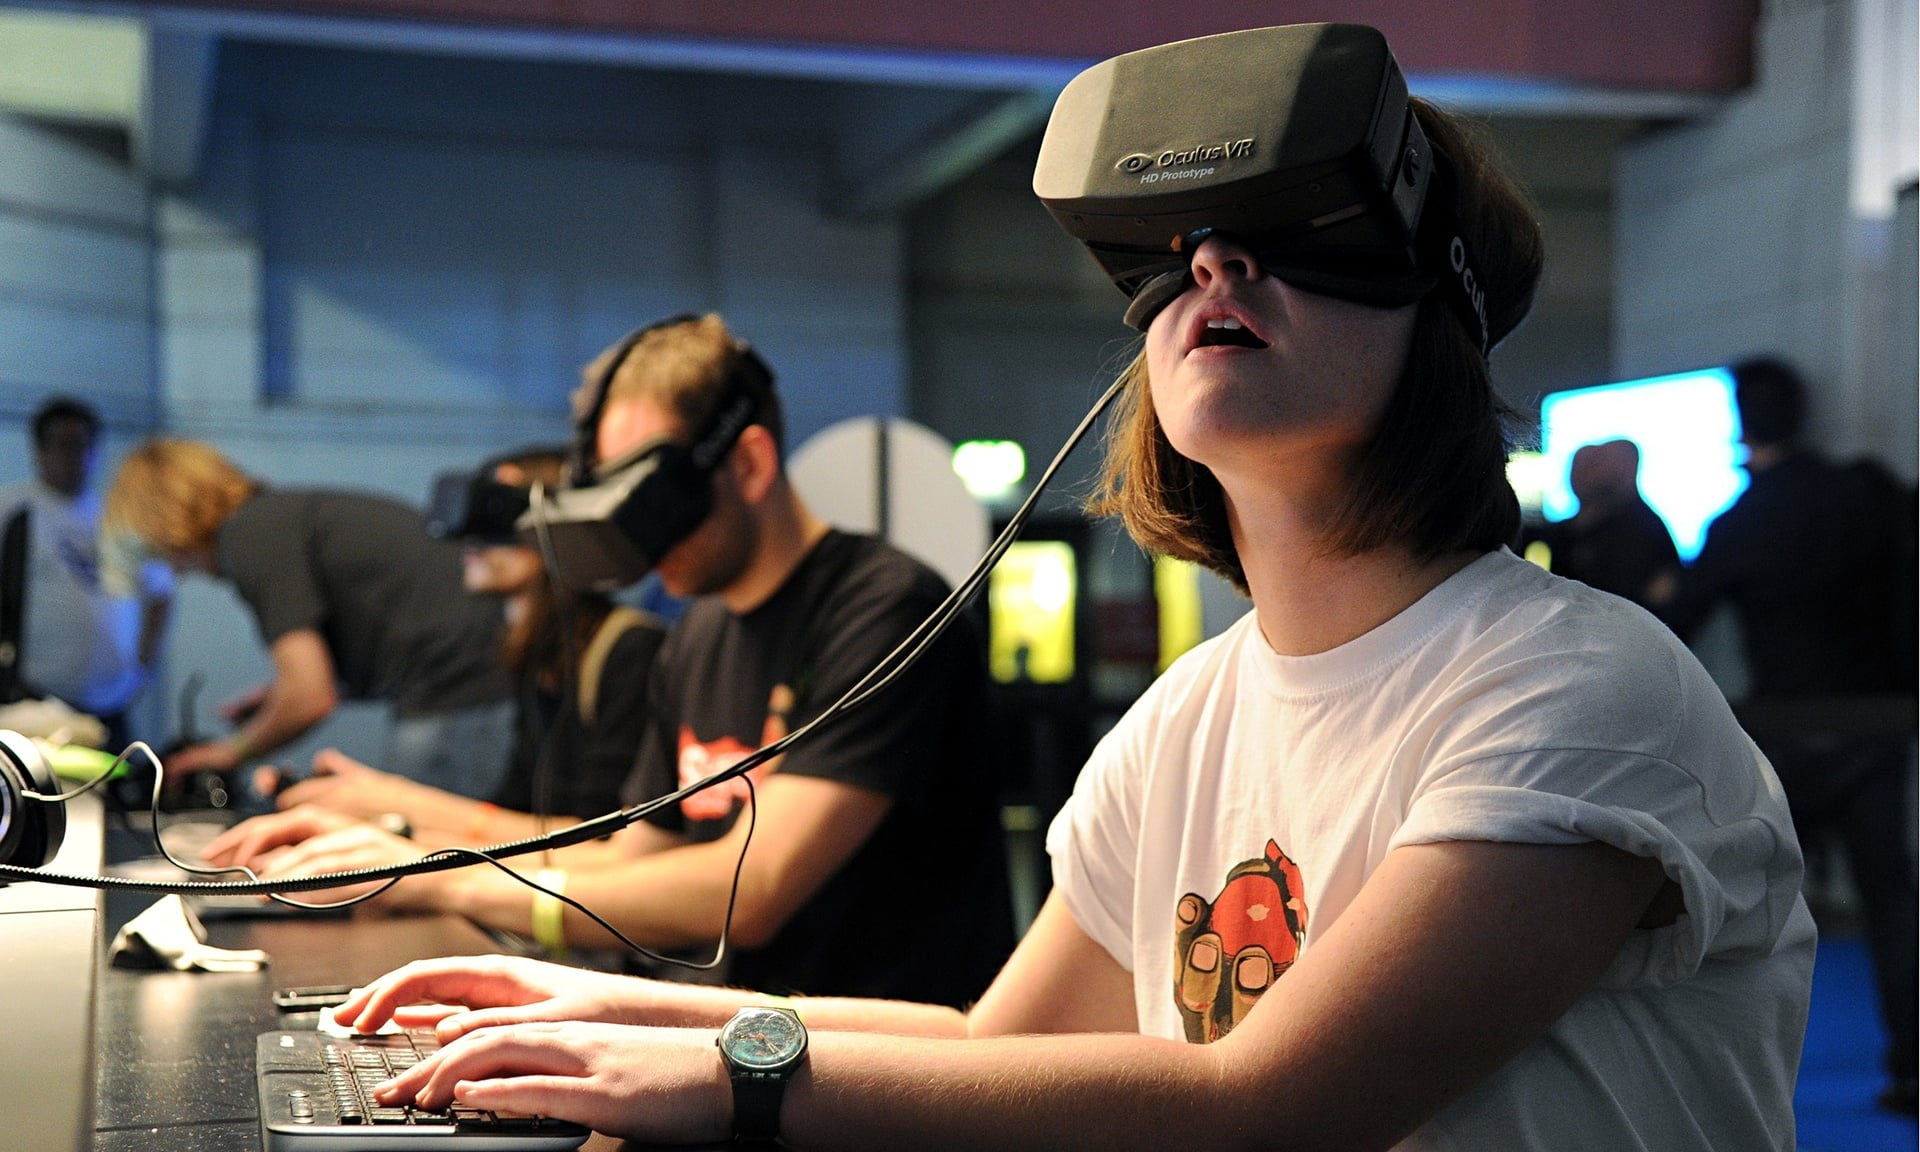 Photograph: Michael Bowles/REX Source: http://www.theguardian.com/technology/2014/mar/31/oculus-rift-facebook-virtual-reality